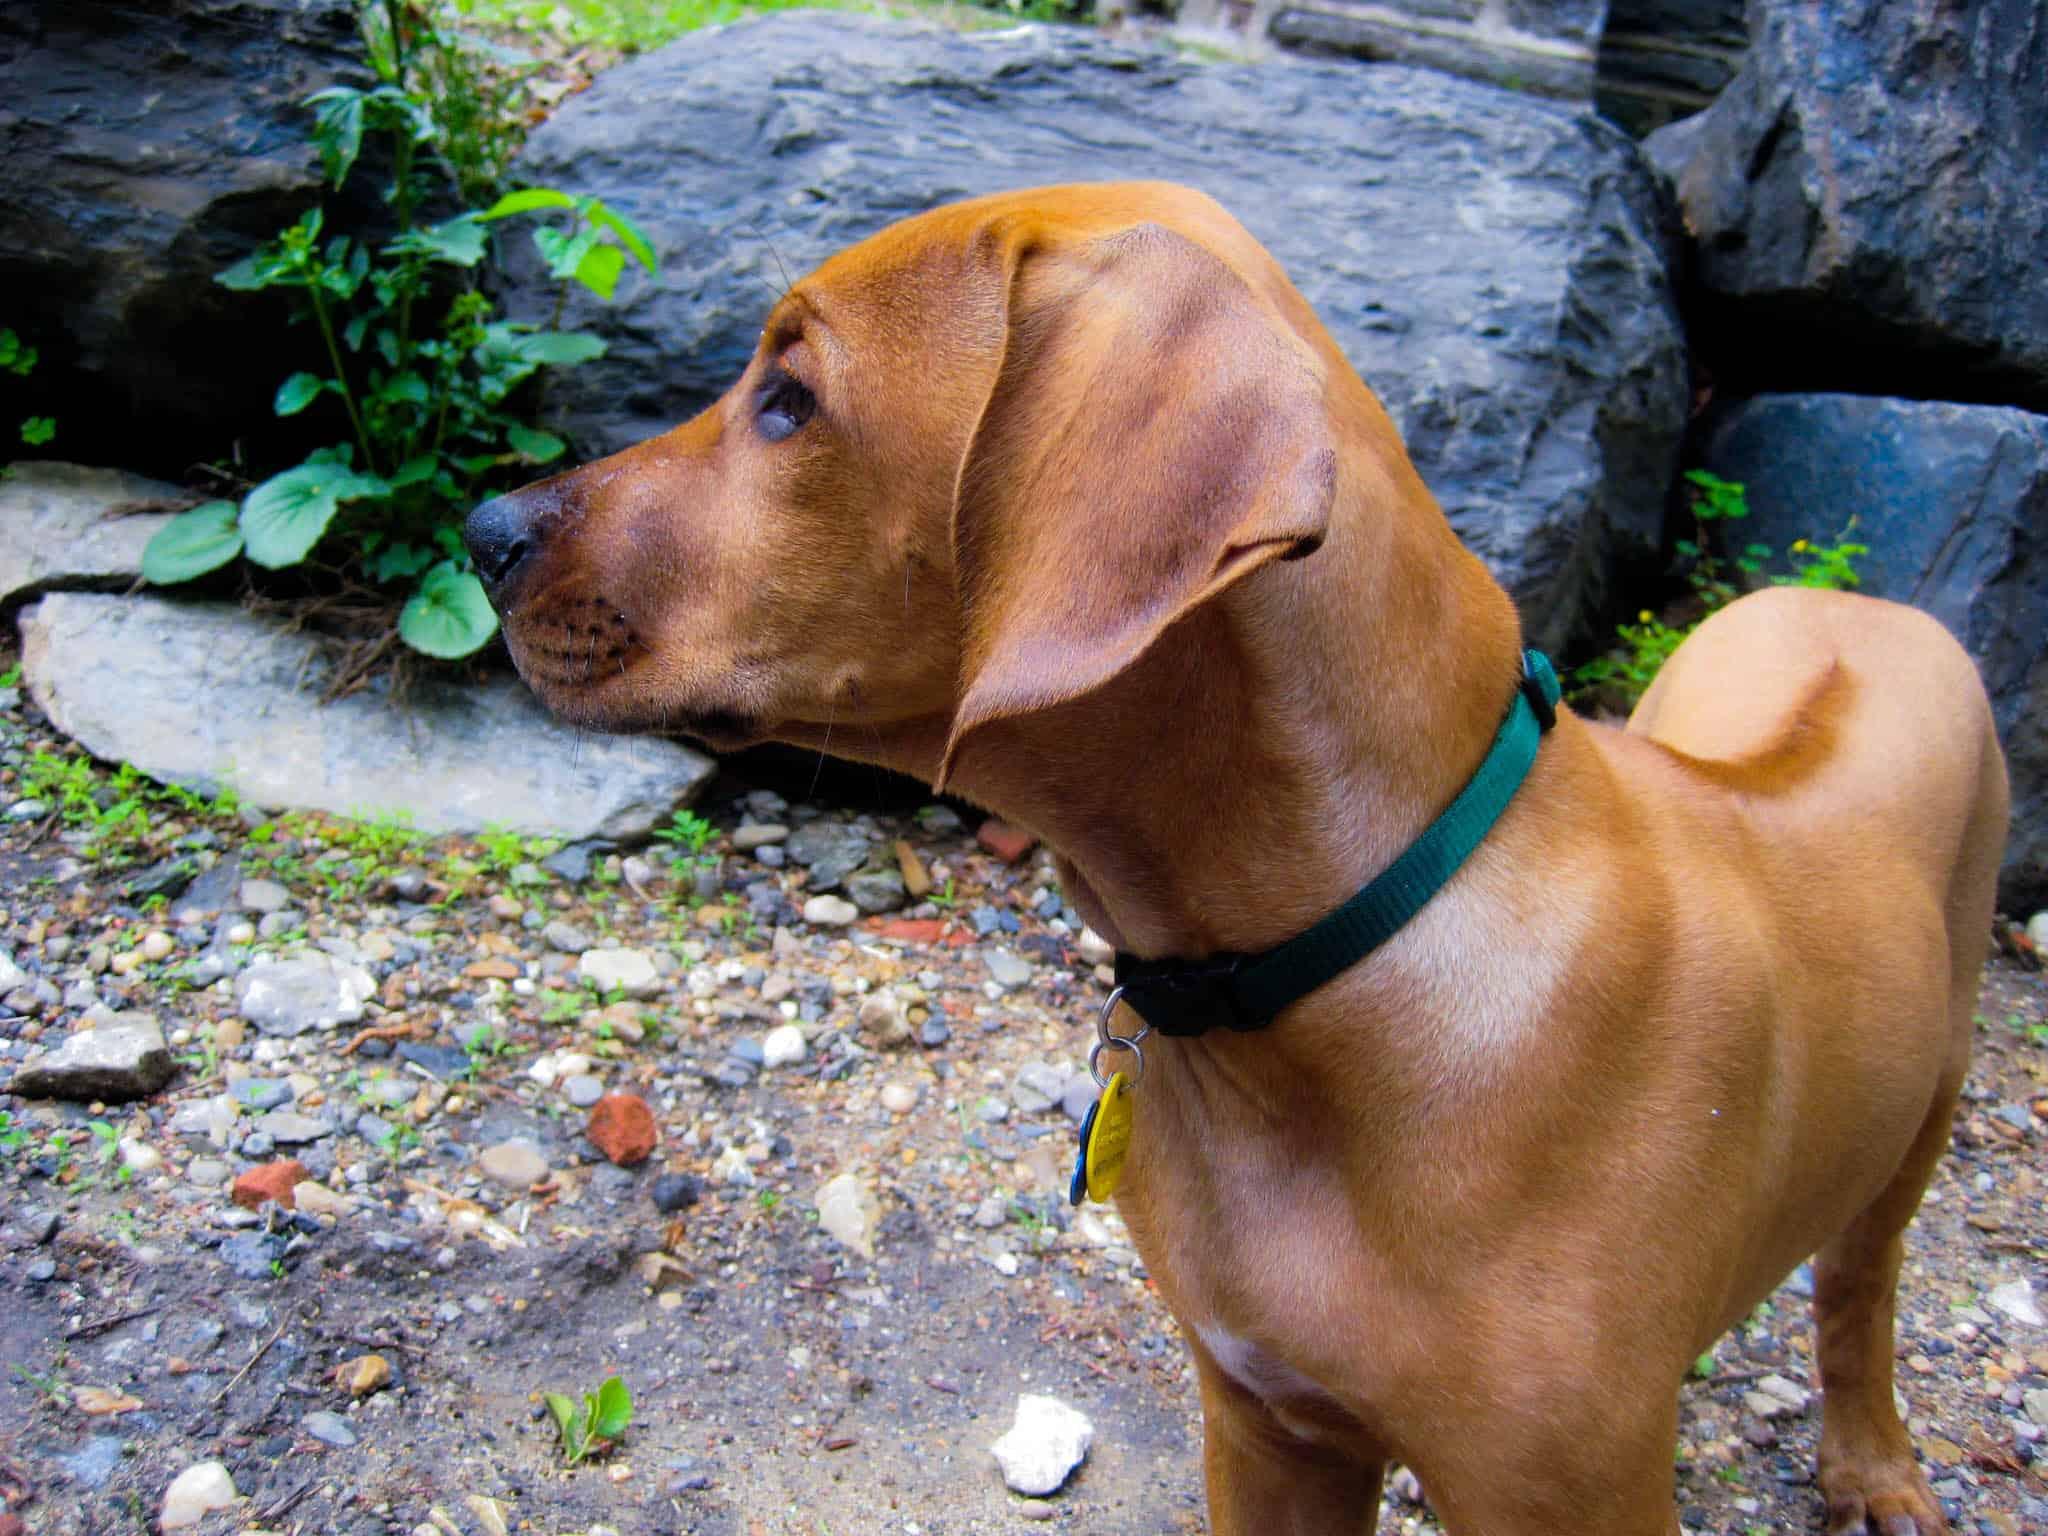 Rhodesian Ridgeback, Rhodesian Ridgeback puppy, Rhodesian Ridgeback photo, dog adventure, dog blog, marking our territory, petcentric